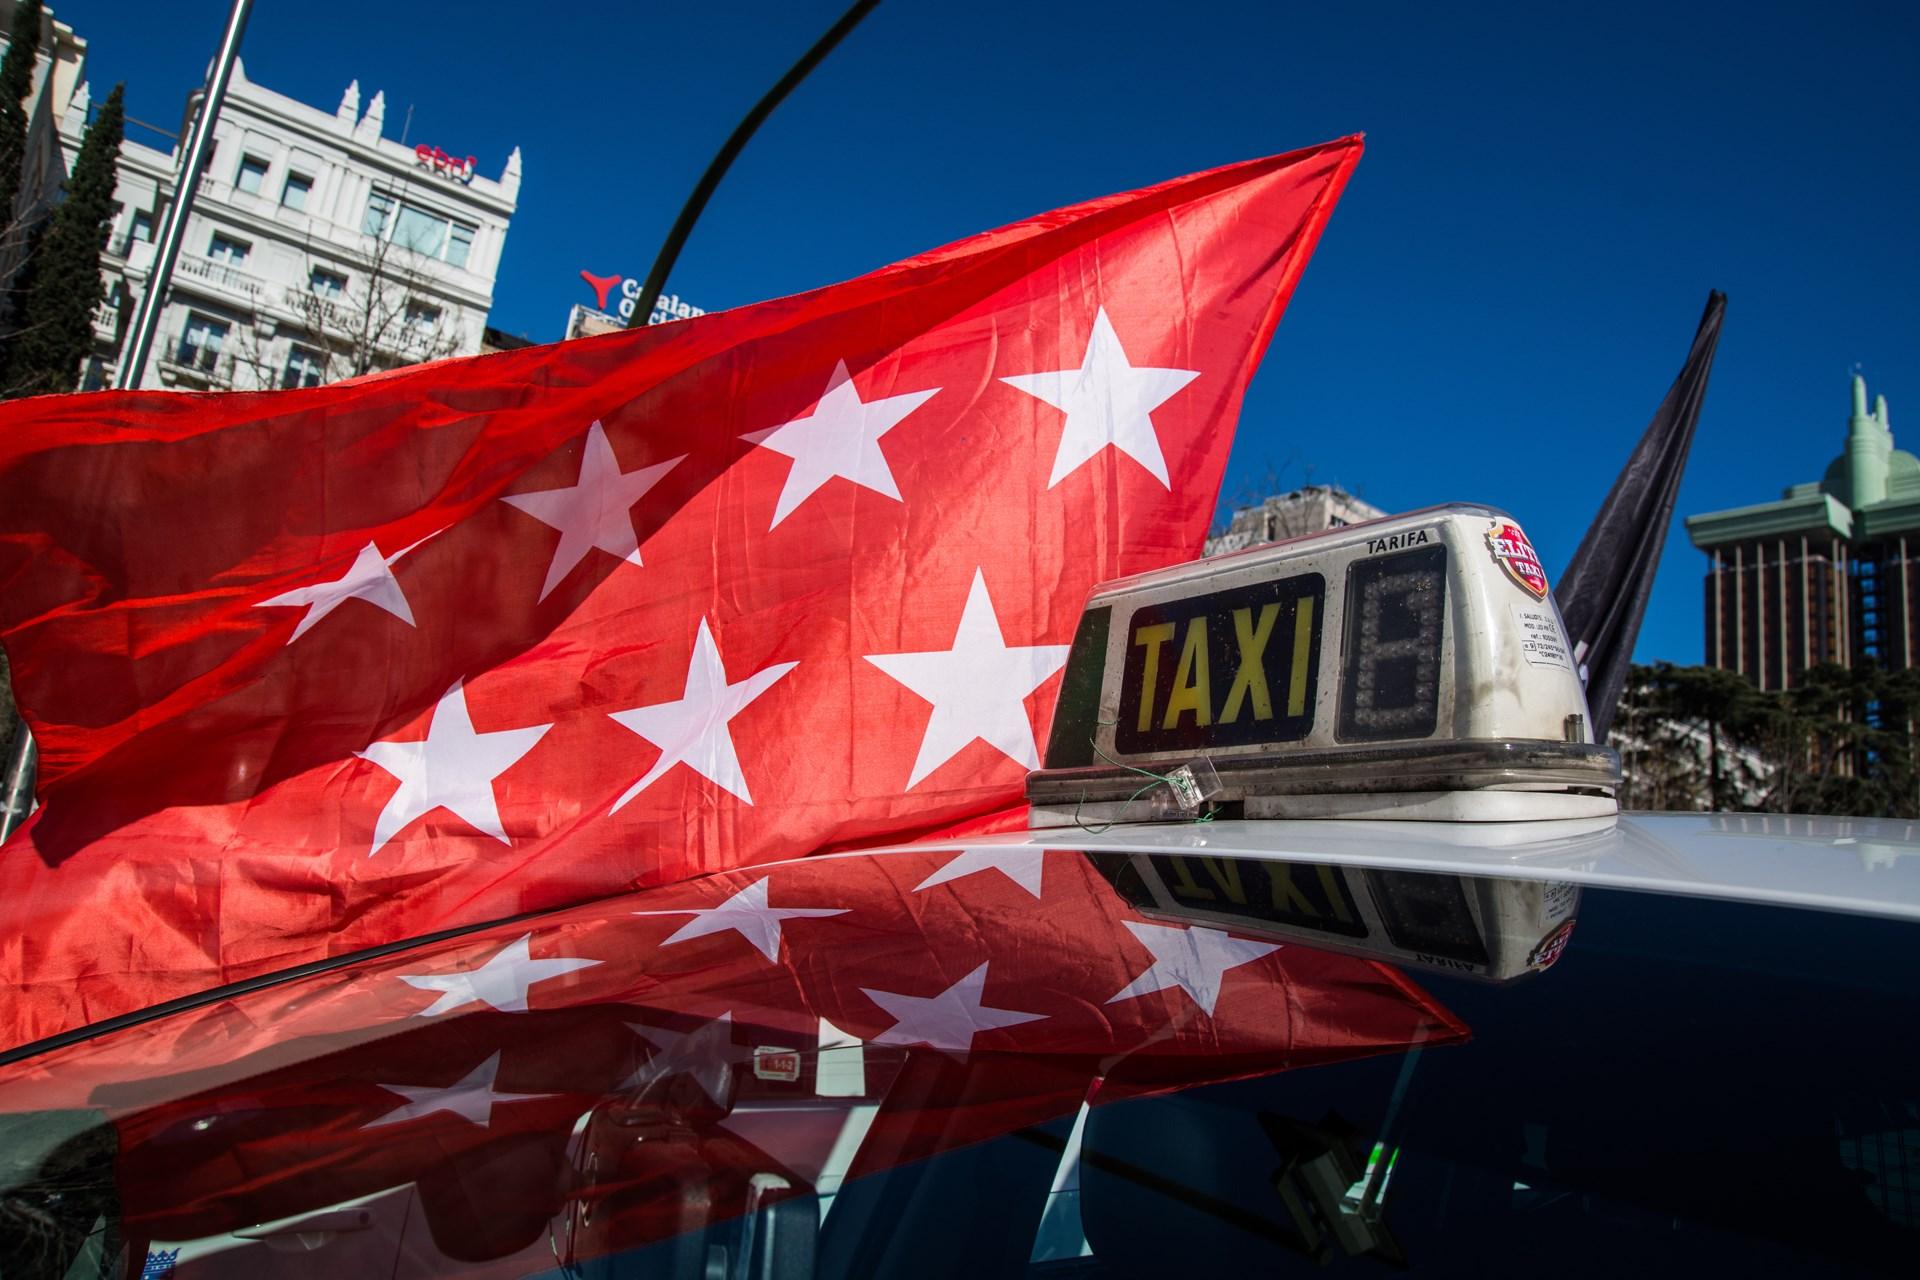 Spain Embraces The Ridesharing Economy Foundation For Economic